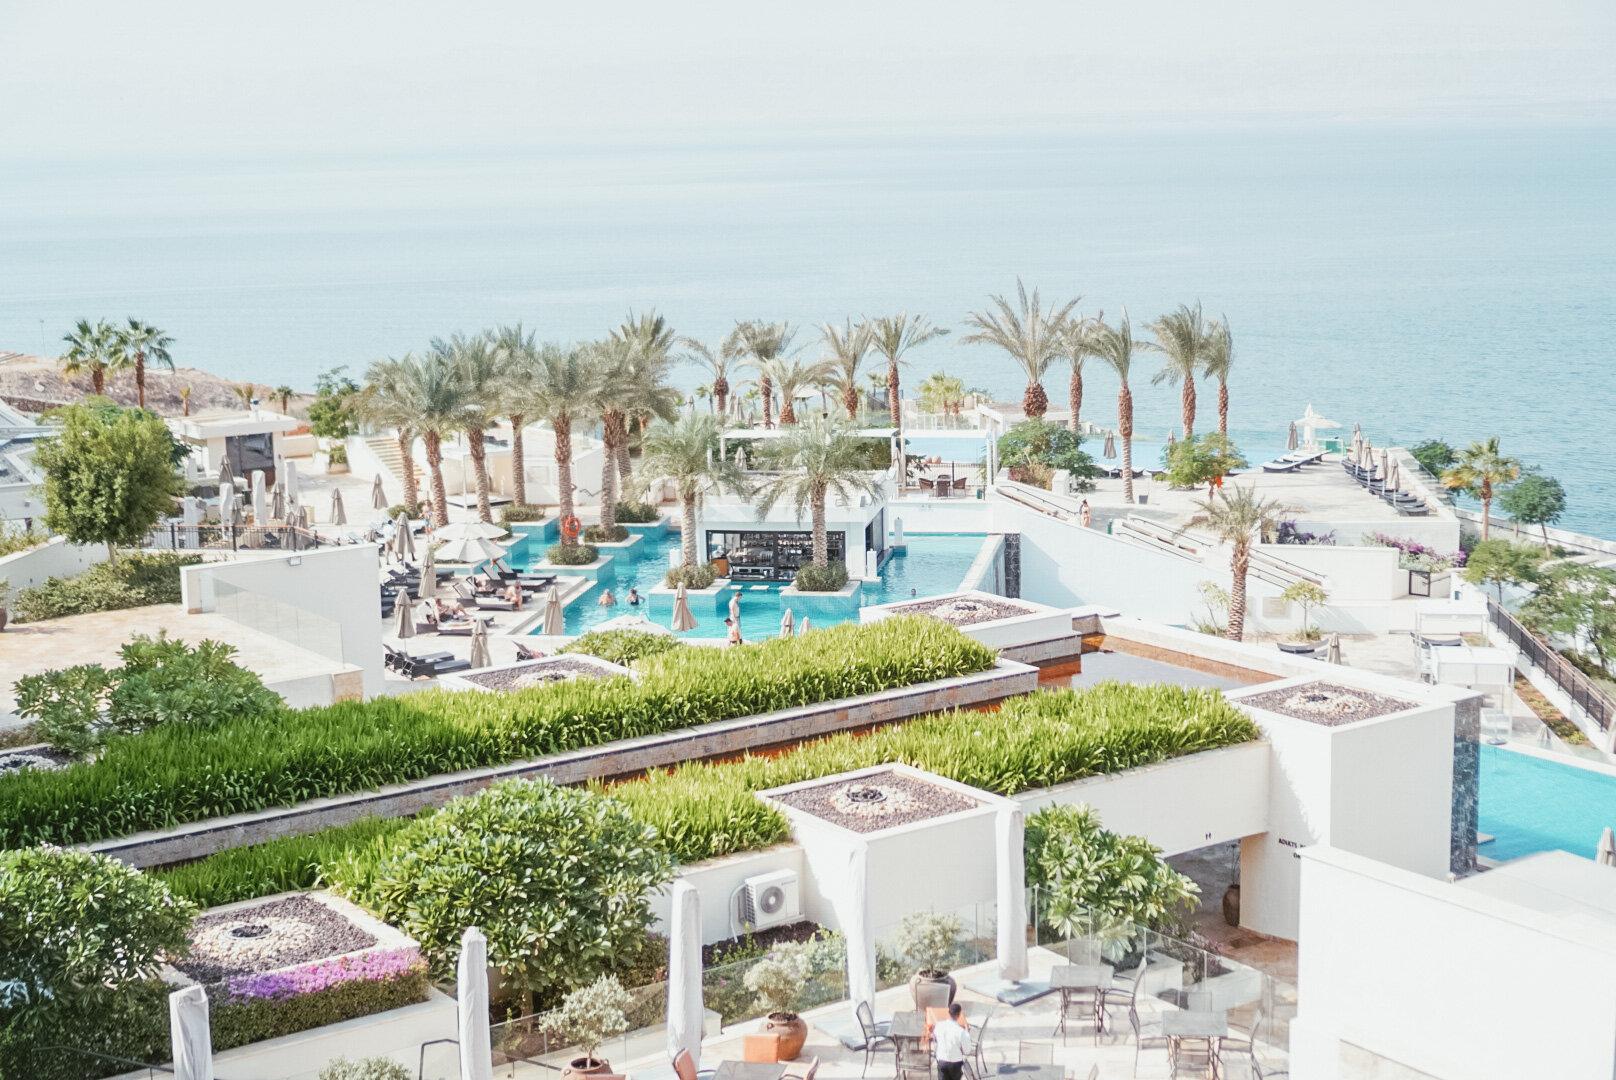 The Hilton Dead Sea Resort